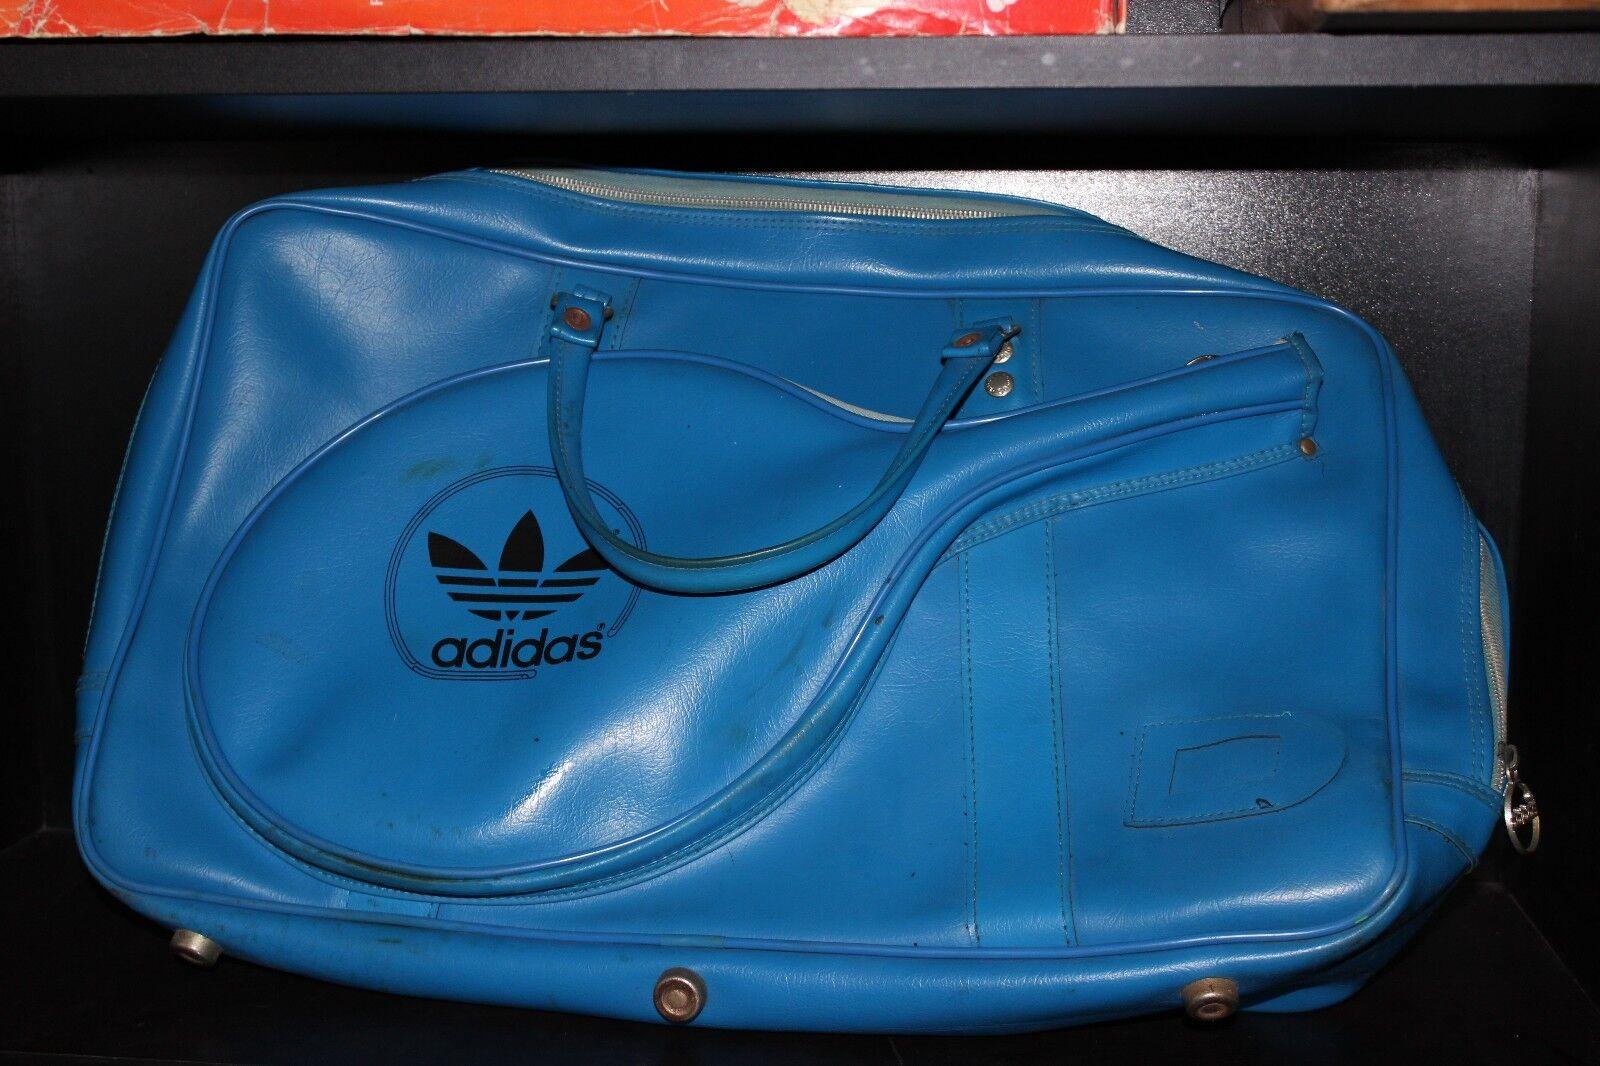 Vintage 1970s Adidas Tennis Bag